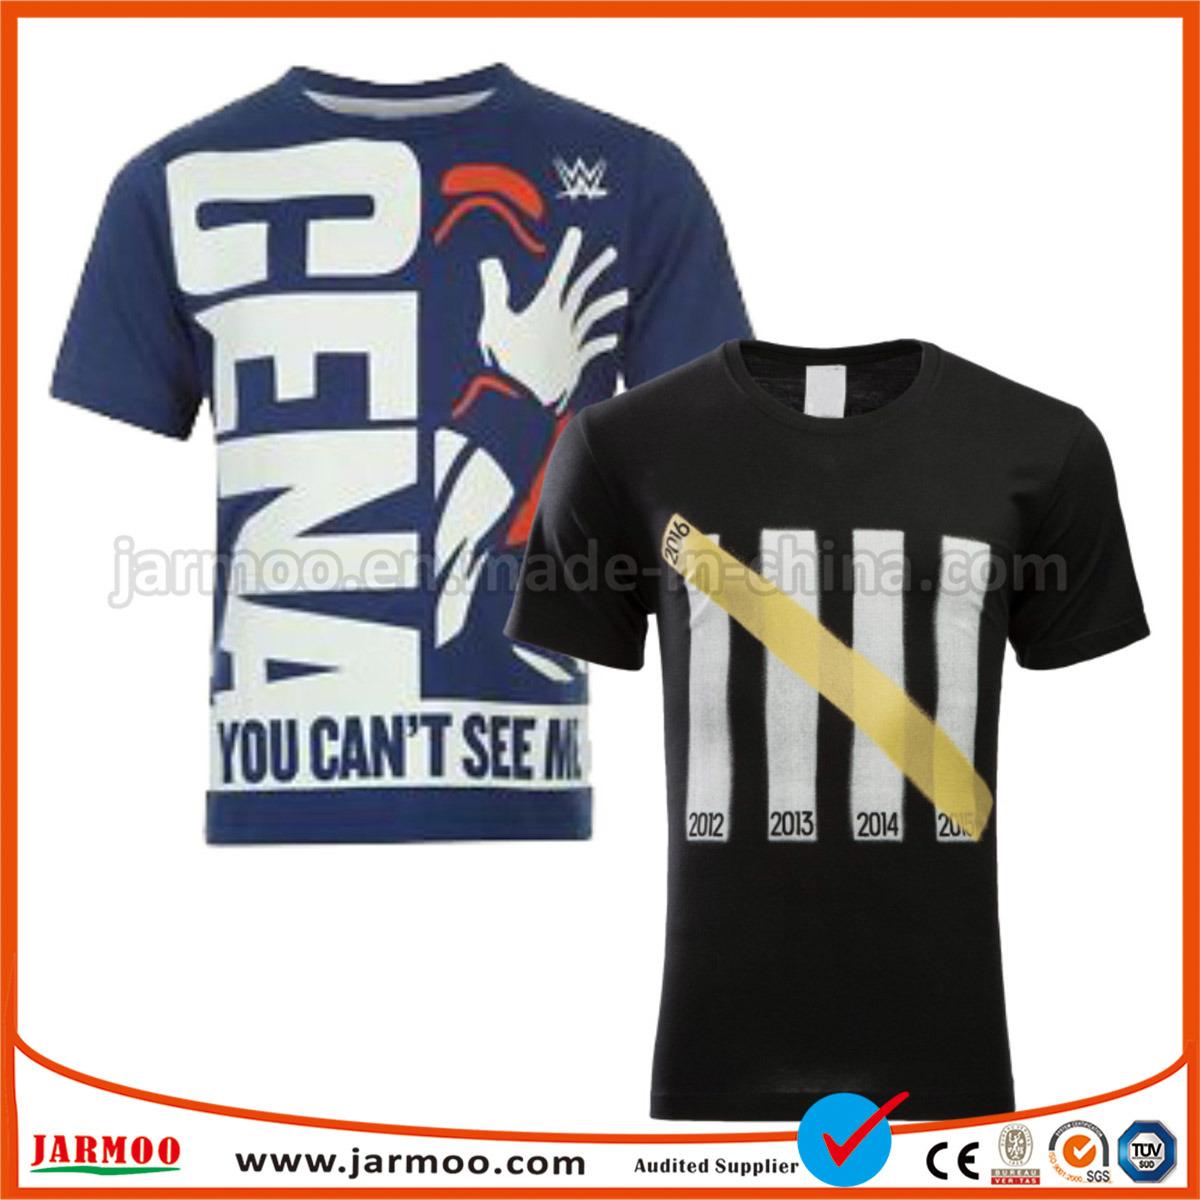 Cheapest Digital Printing T Shirts - DREAMWORKS